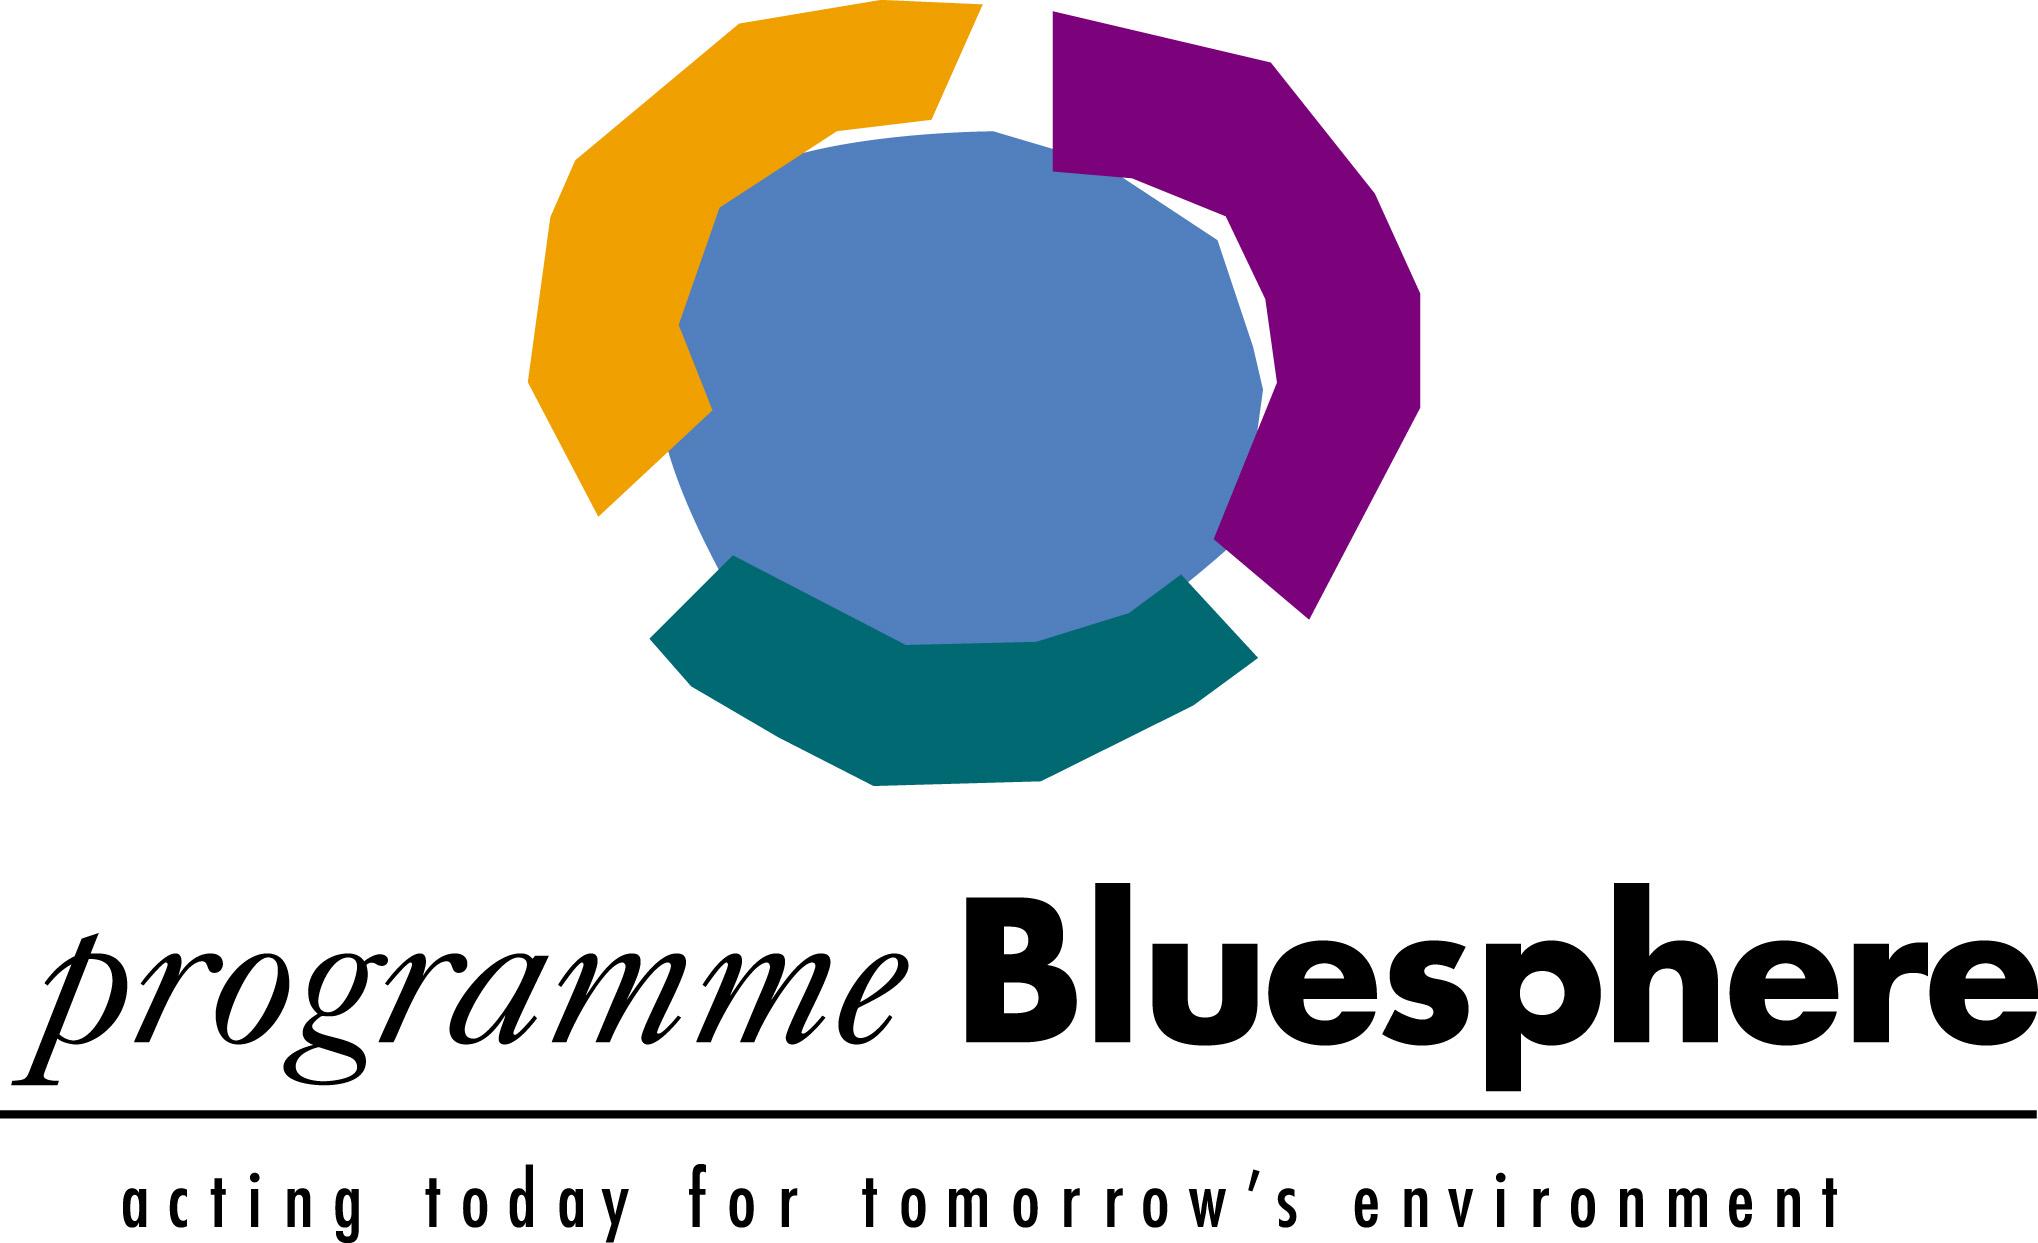 BLS bluesphere logo w:type.jpg